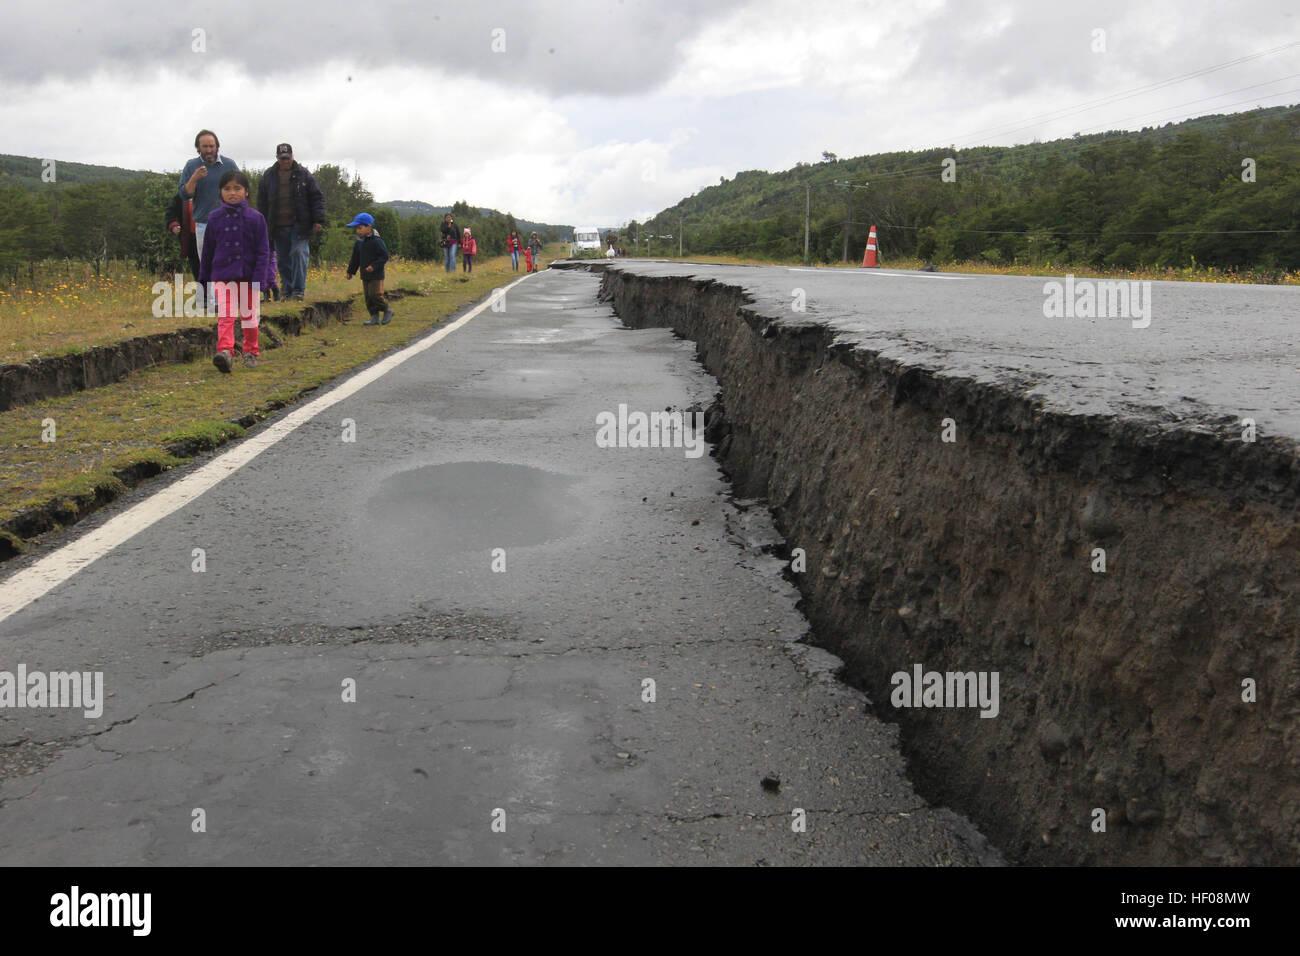 Provincia de Chiloé, Chile. 25 de diciembre de 2016. Foto tomada el 25 de diciembre de 2016 muestra una carretera Foto de stock